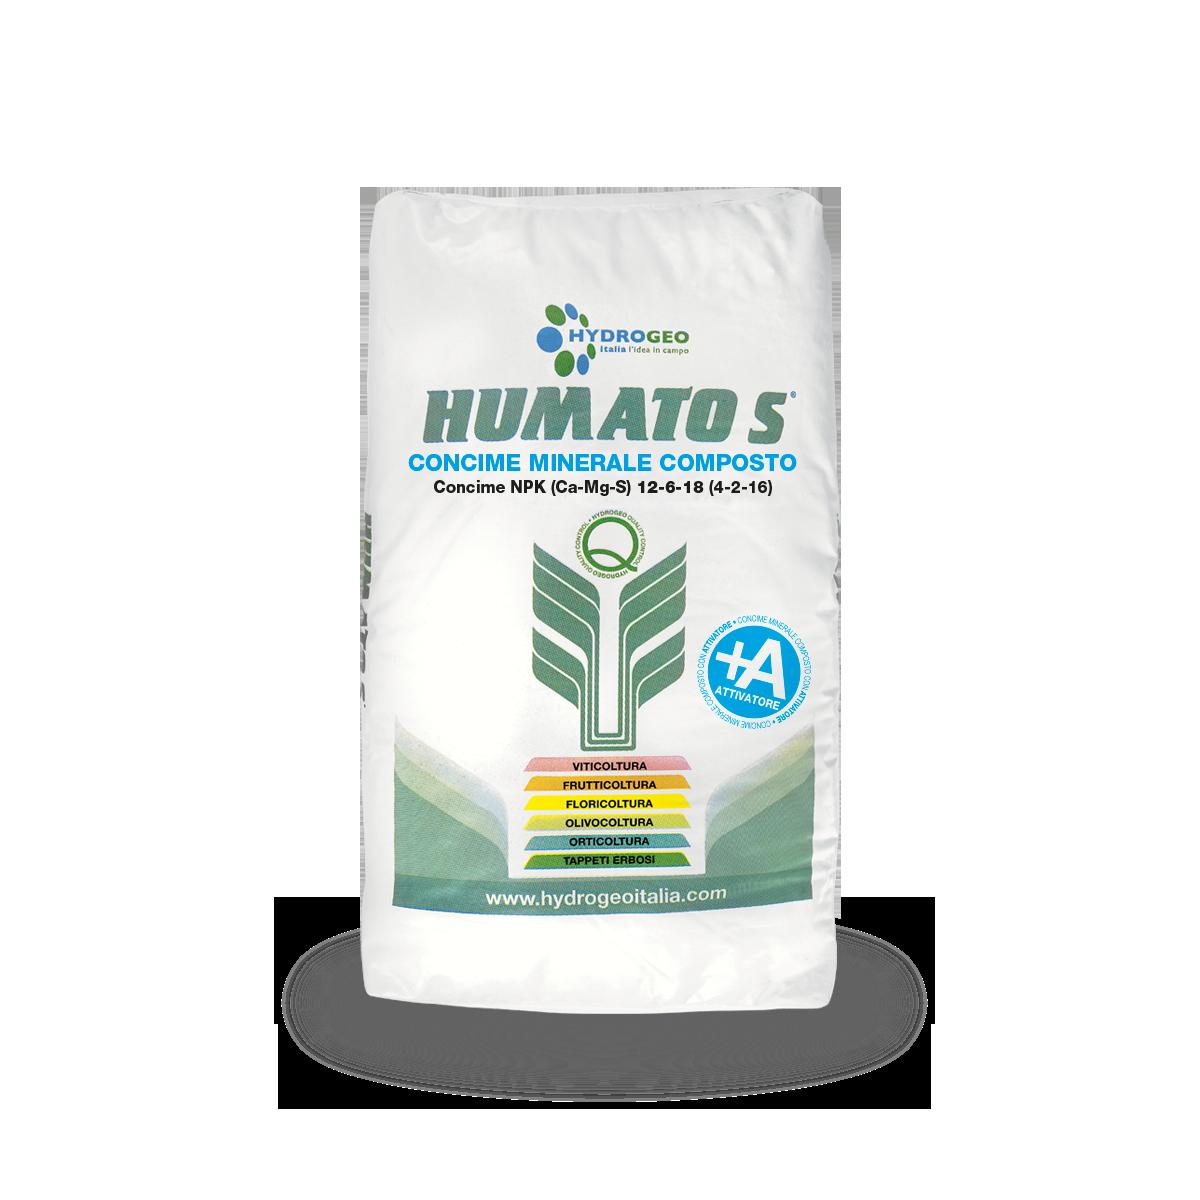 Humato S 12.6.18